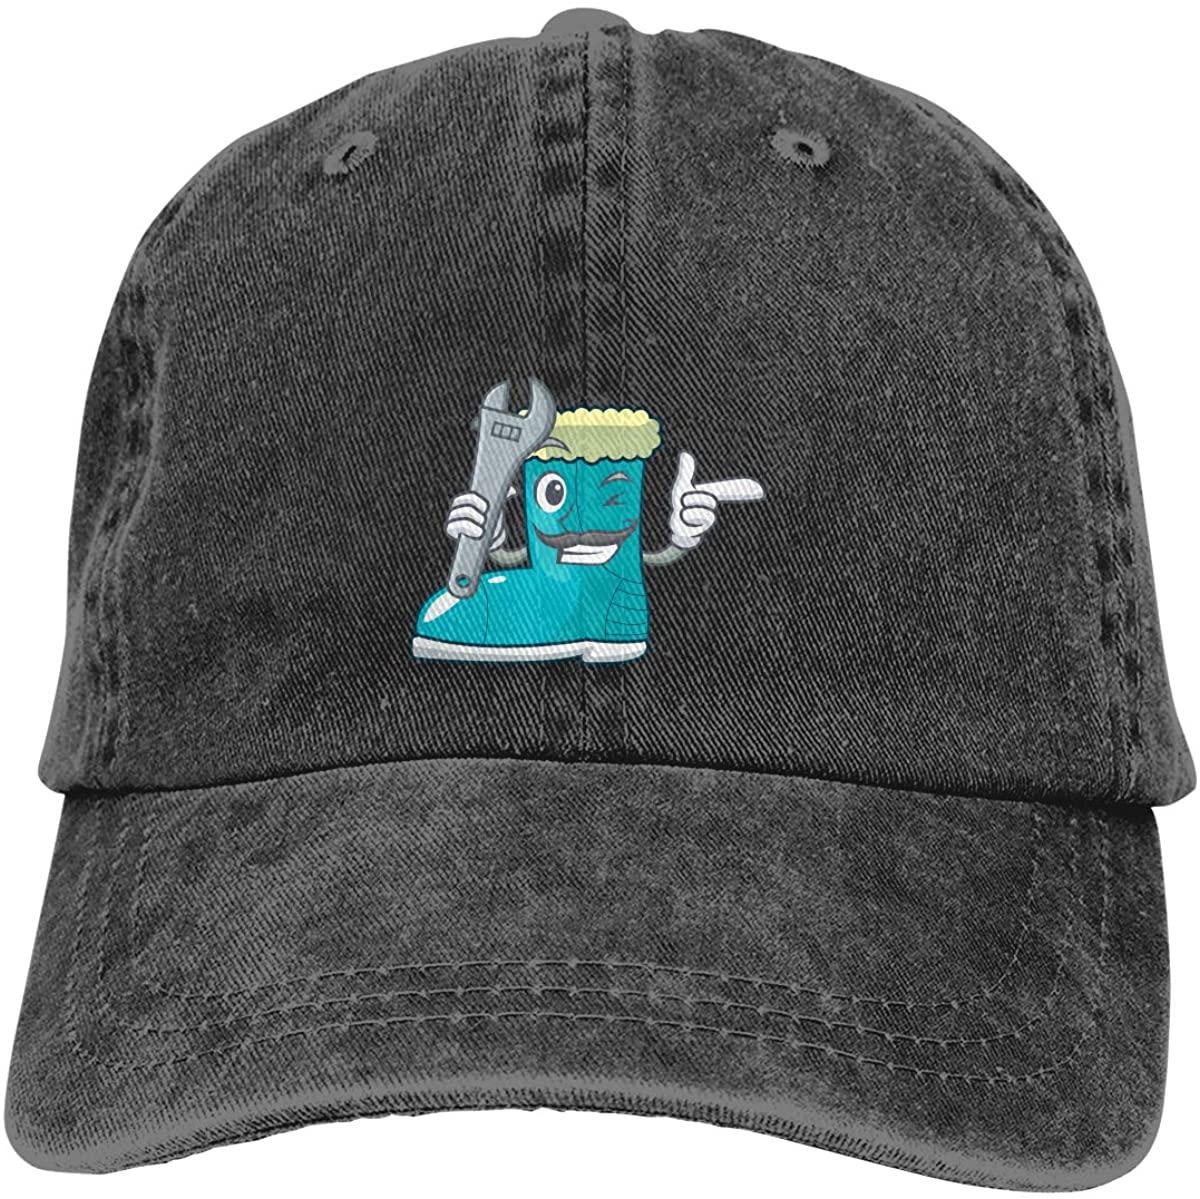 NOT Mechanic Winter Boot Adjustable Unisex Hat Baseball Caps Black